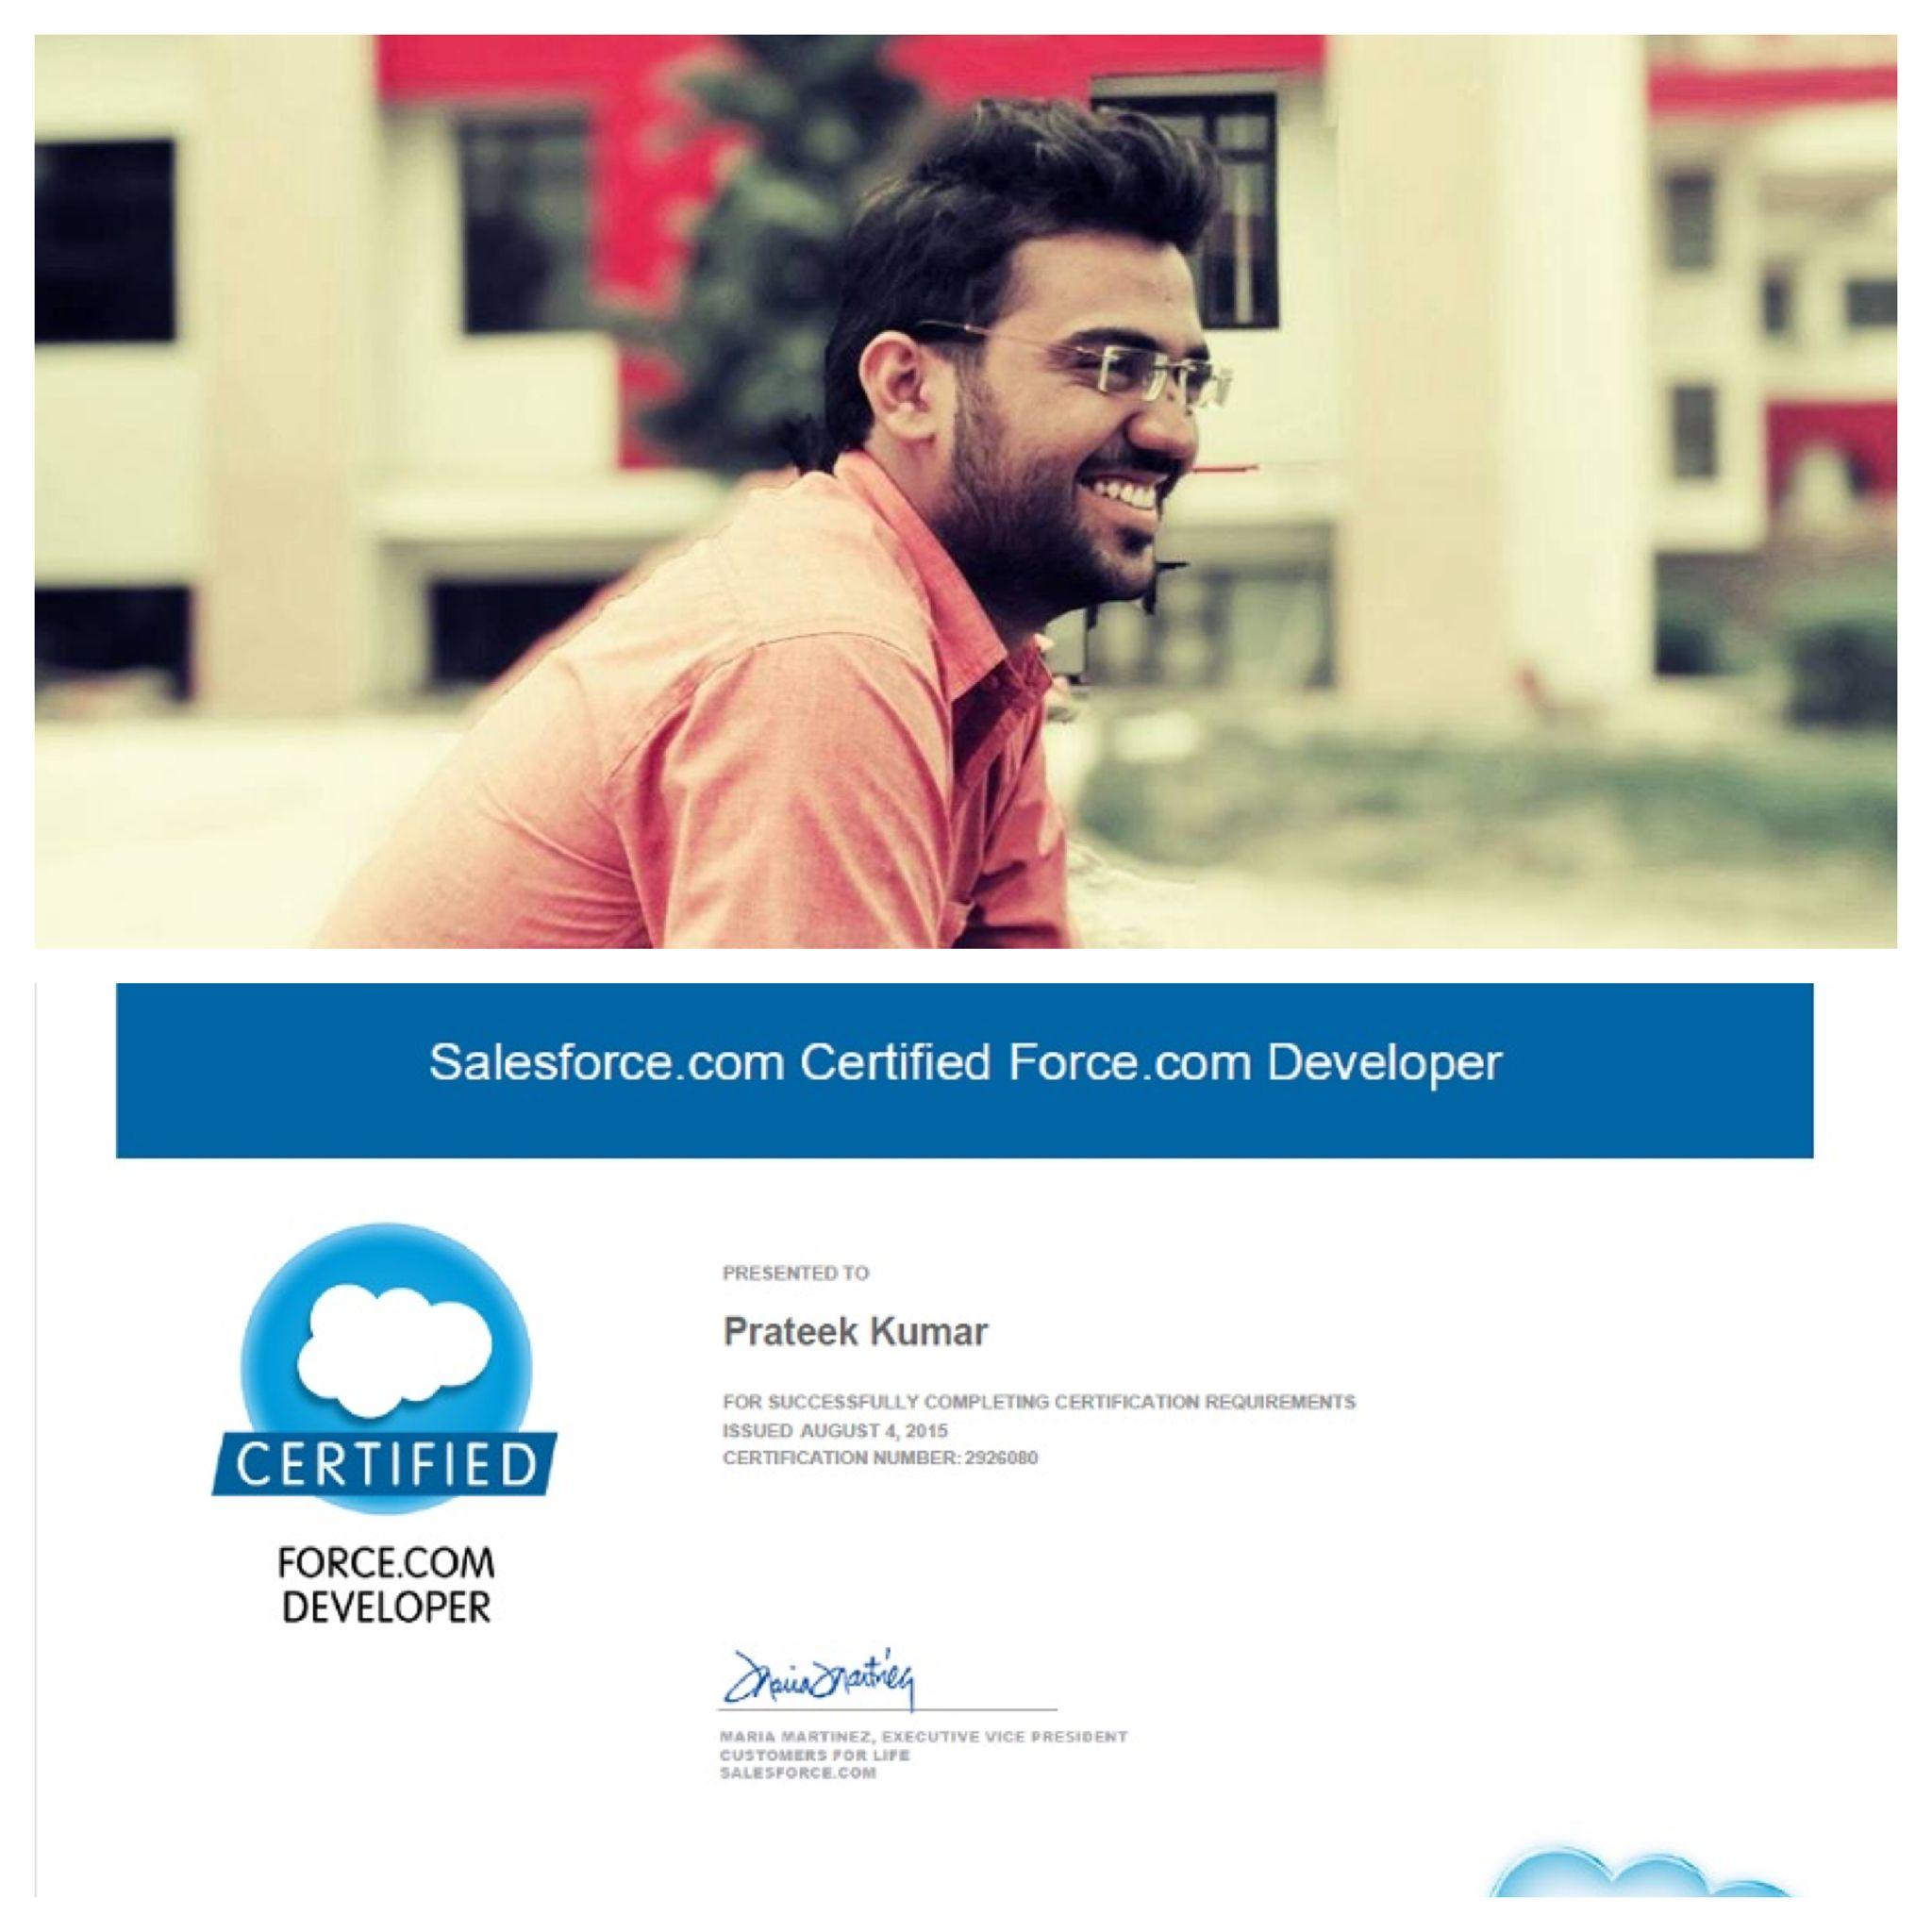 Salesforce Certified Force Developer From Bodacious It Hub